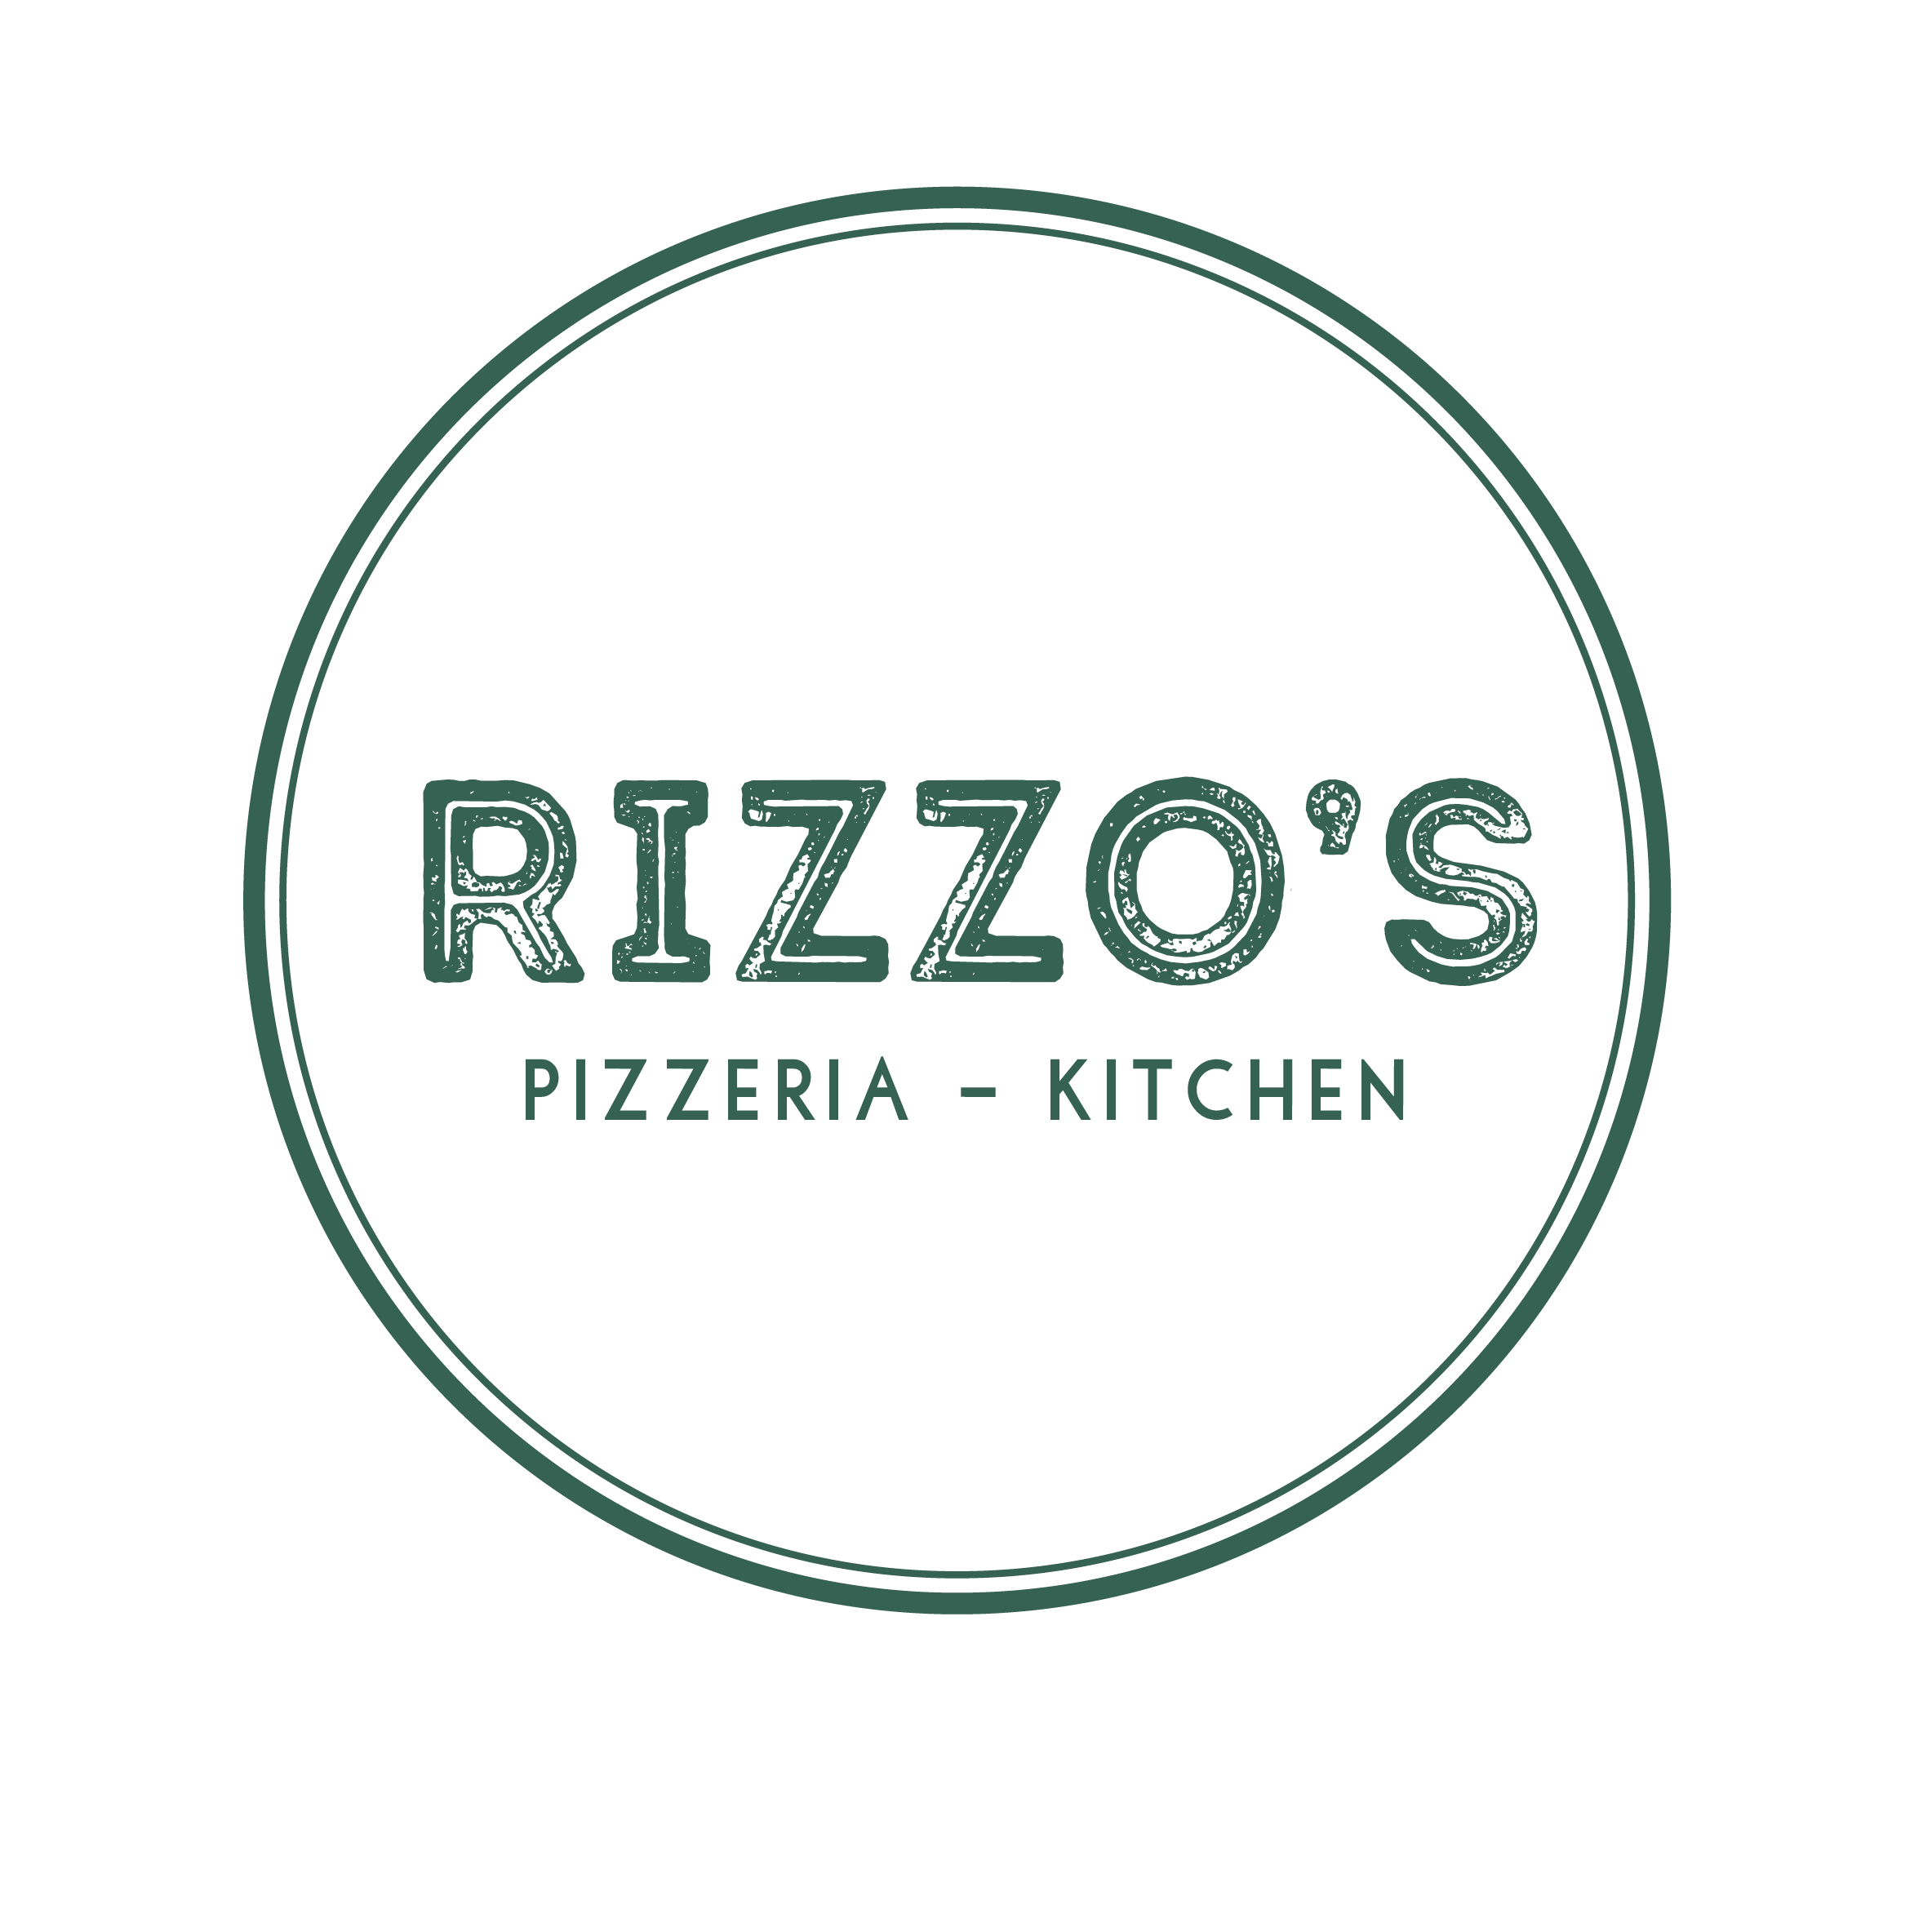 Rizzo's Pizzeria - Kitchen